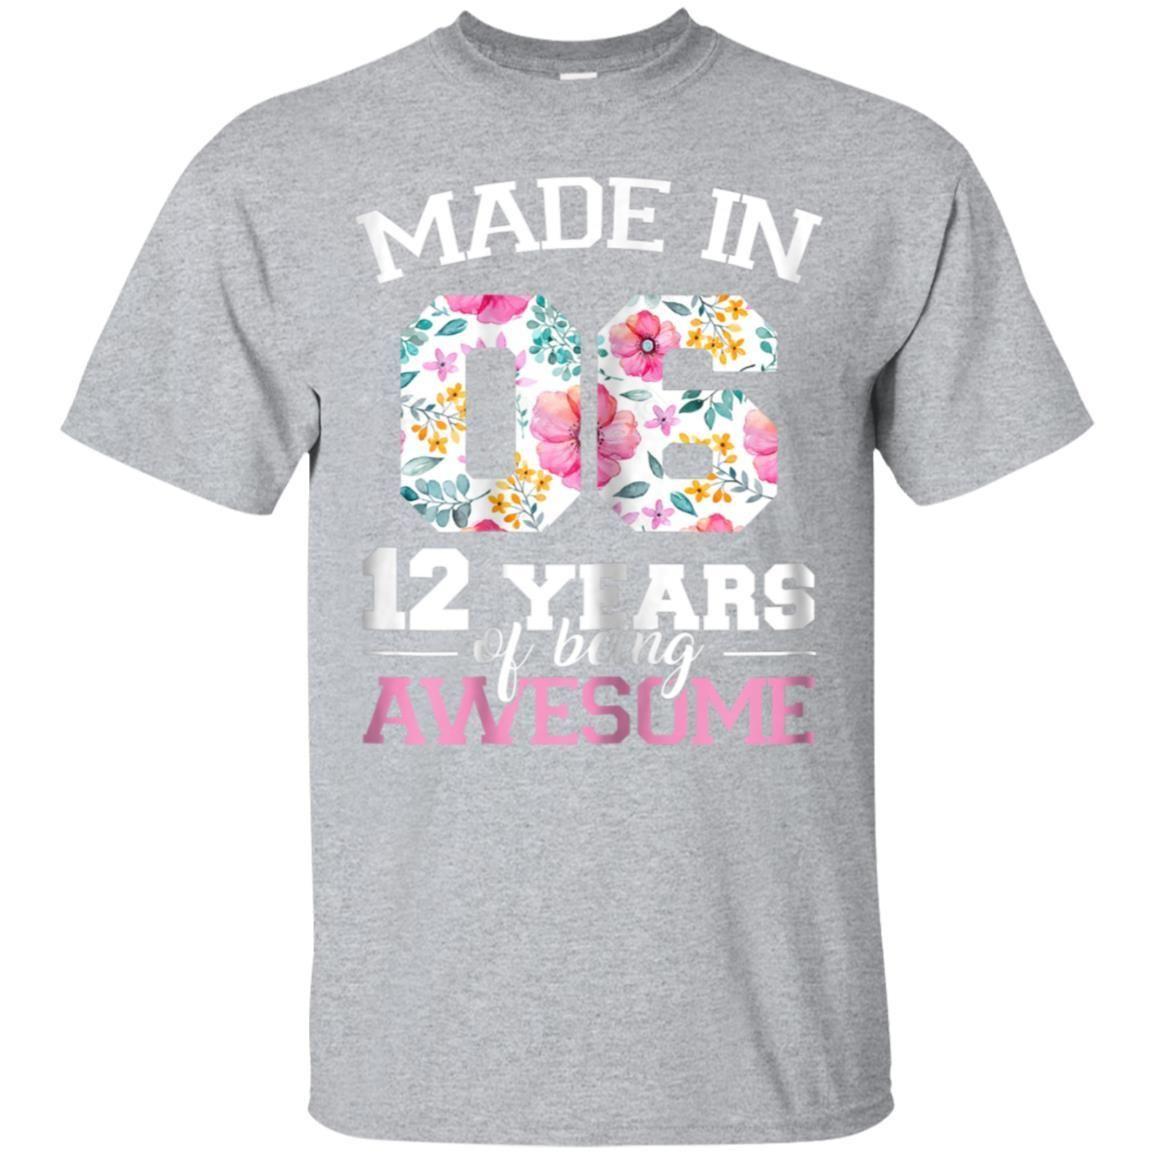 Awesome 12 Year Old Birthday Girl Shirt Born In 2006 12th Birthday Birthday Girl Shirt Kids Birthday Shirts Birthday Girl Shirt Womens